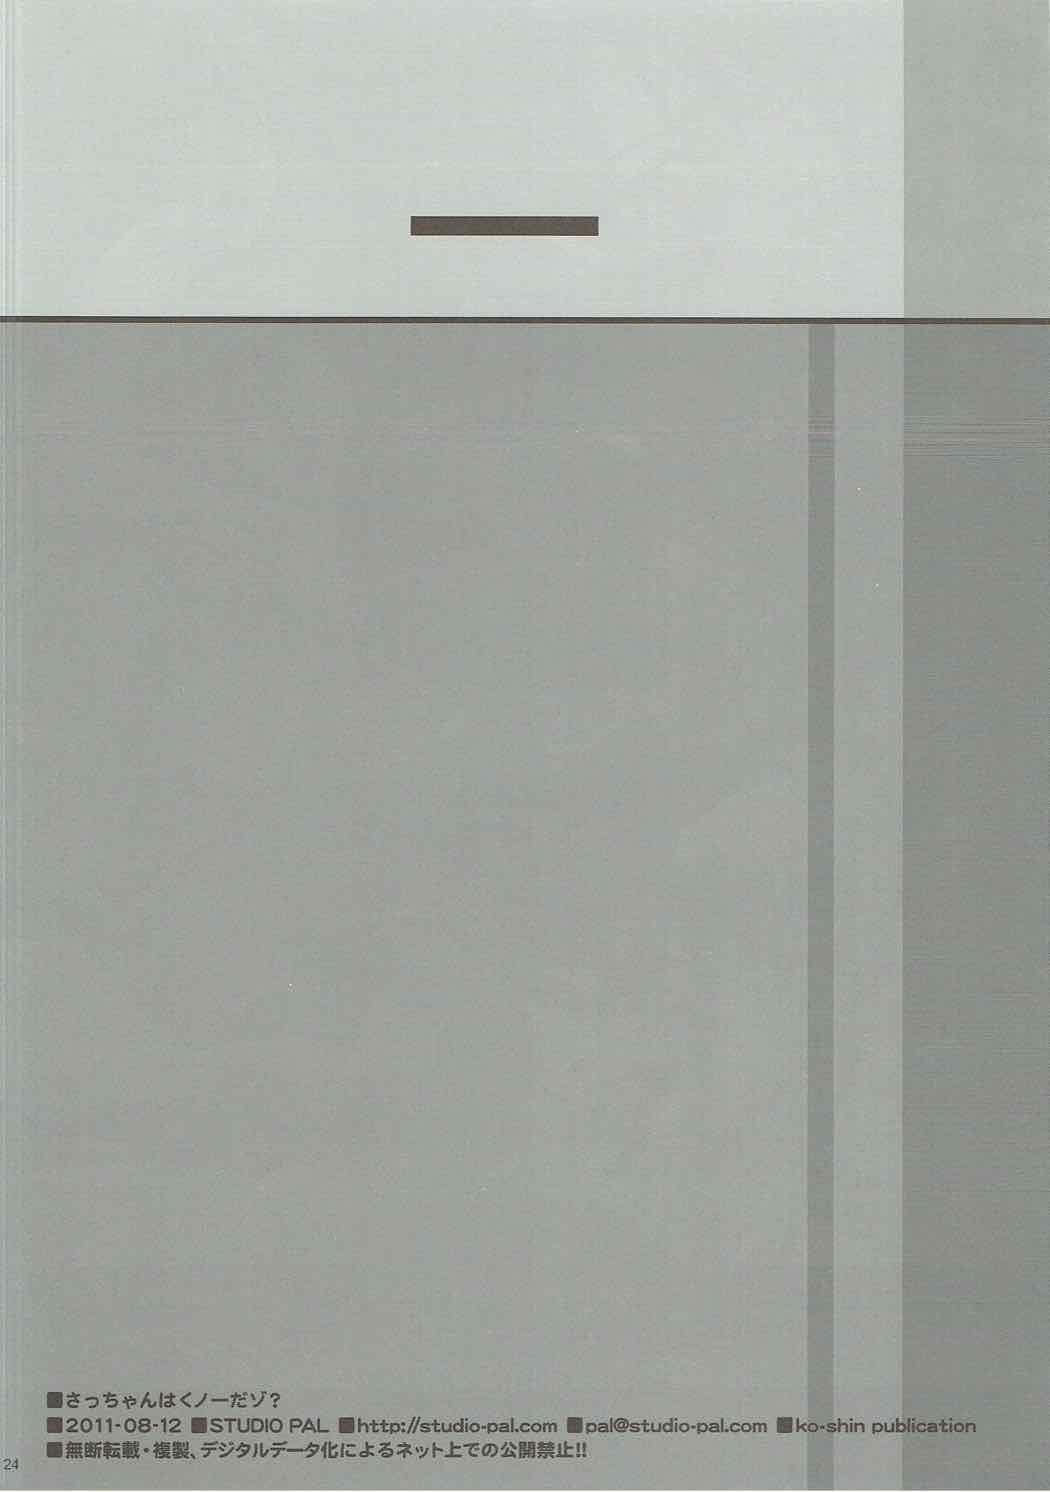 Sacchan wa Kunoichi dazo? 20